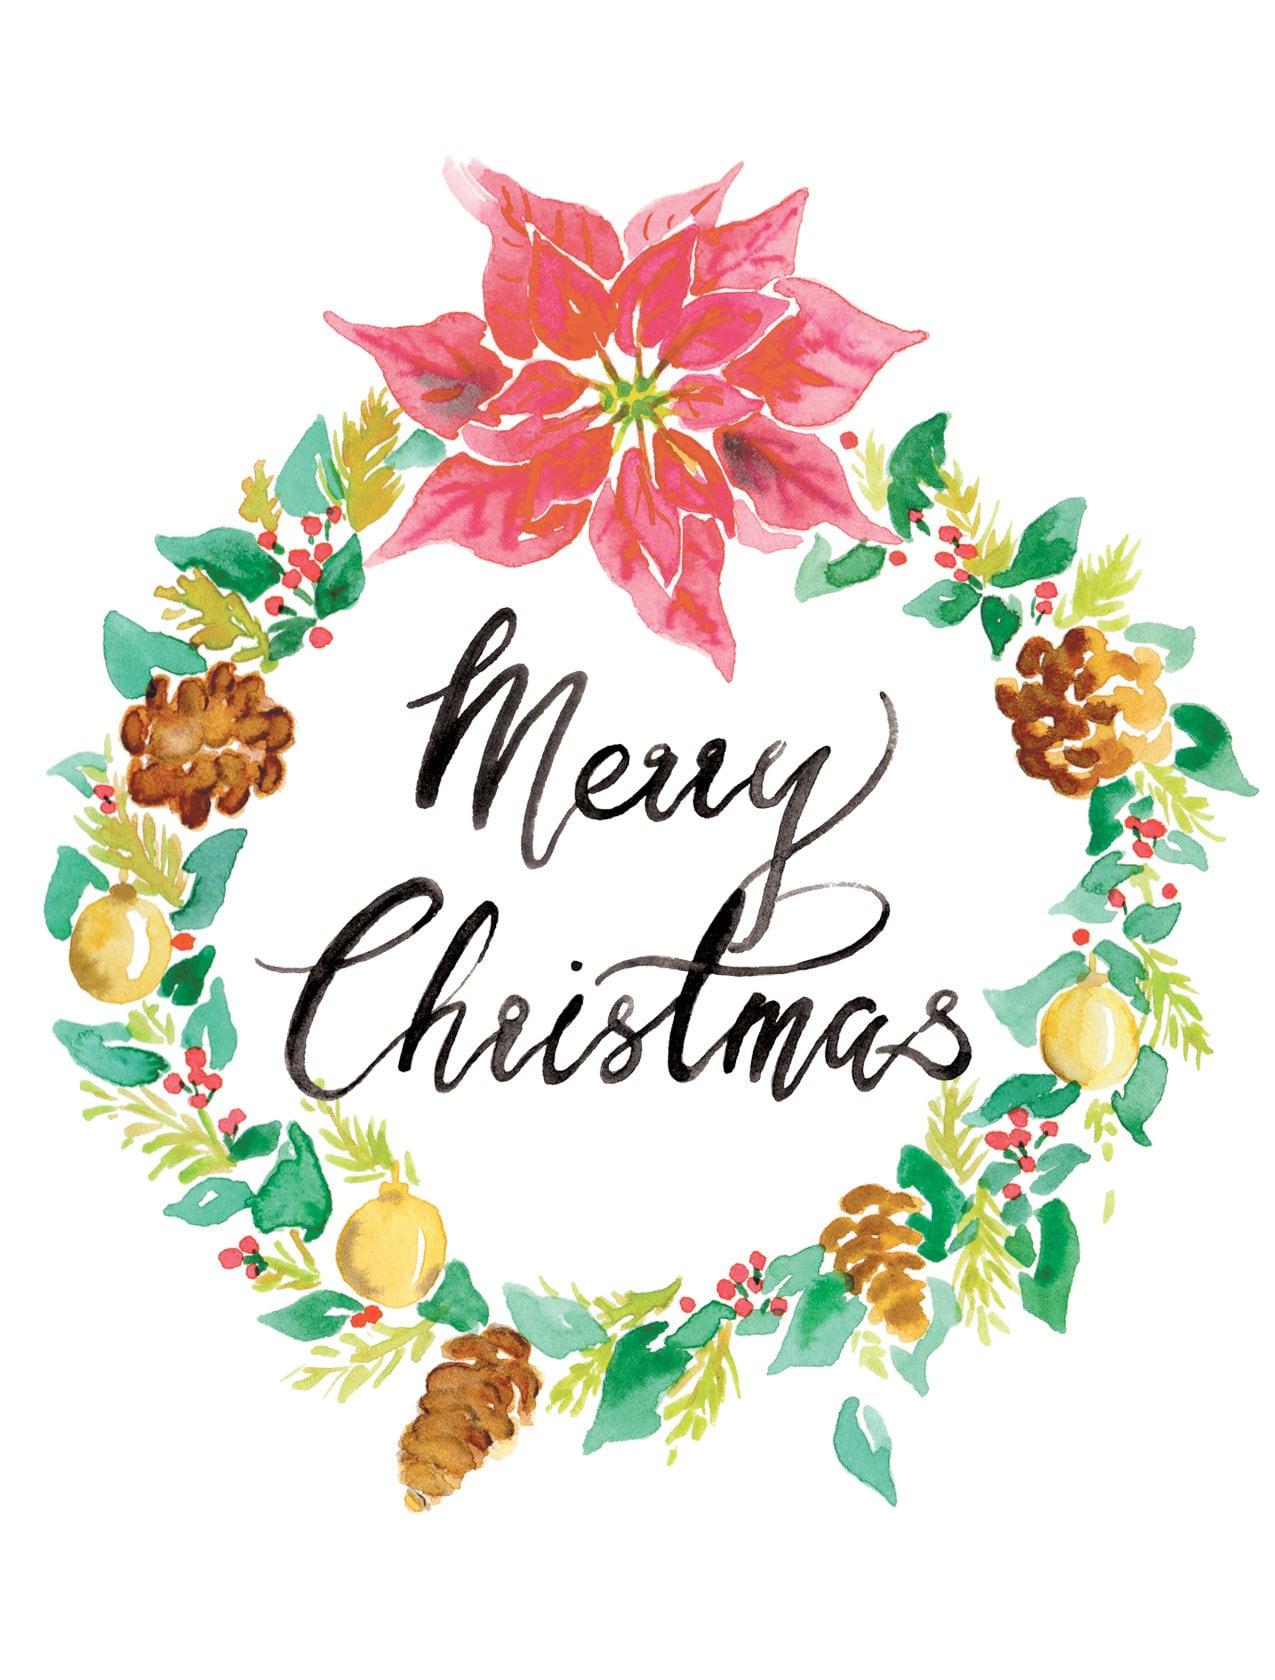 Merry christmas wreath card digital greeting card postcard merry christmas wreath card digital greeting card postcard watercolor poinsettia merry xmas seasons greetings kristyandbryce Choice Image